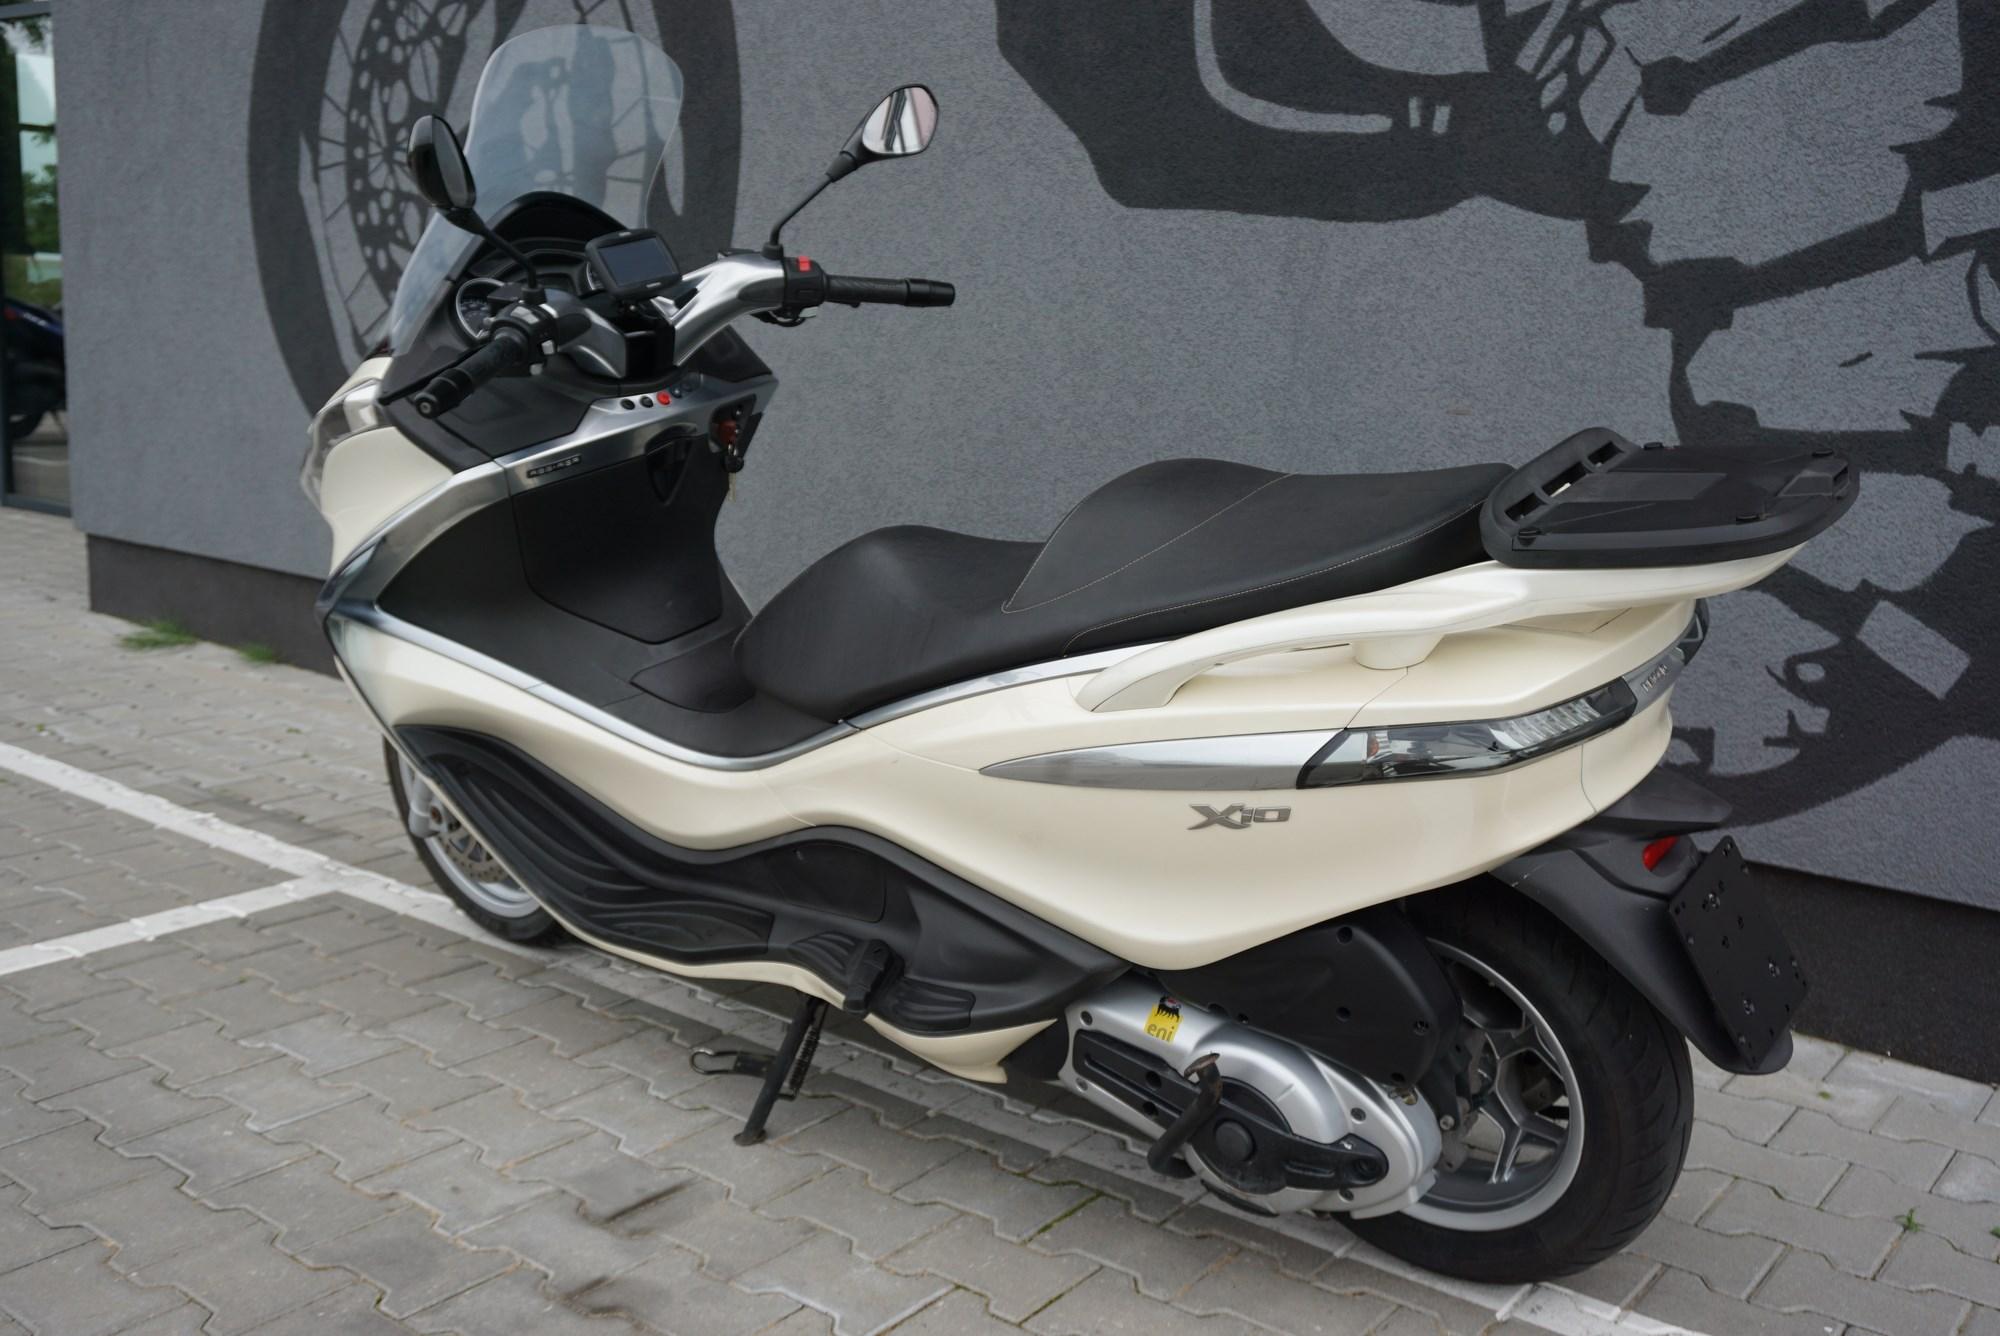 Piaggio X10 500 ABS ASR